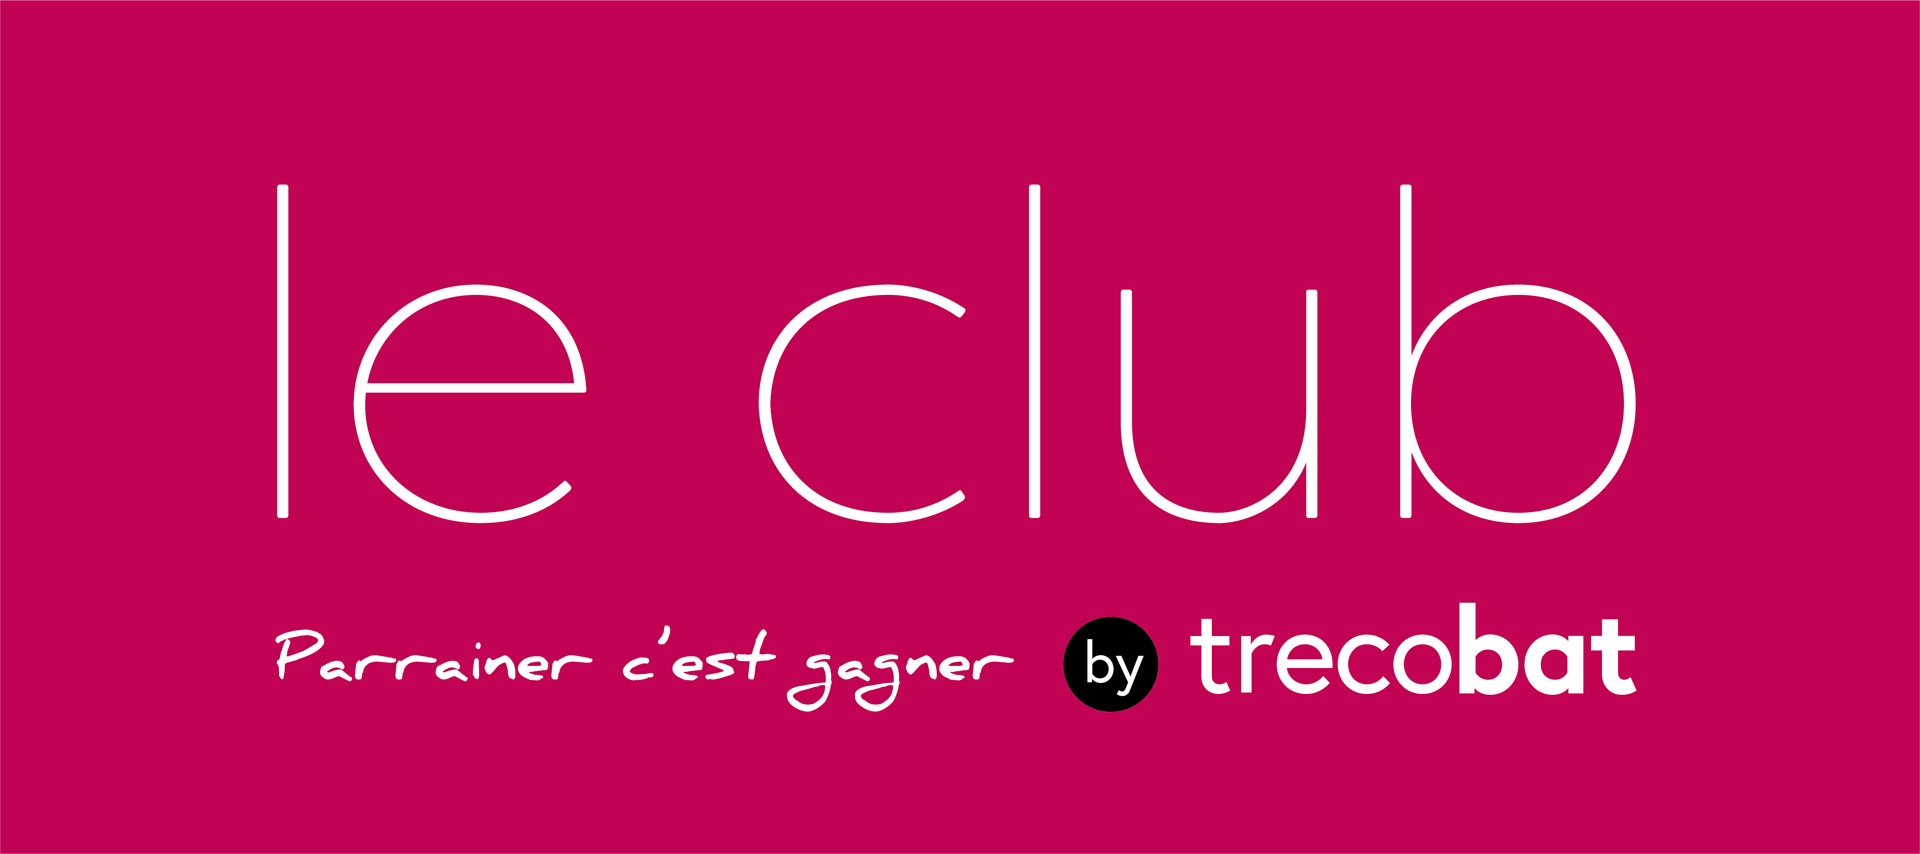 trecobat-club-logo-framboise